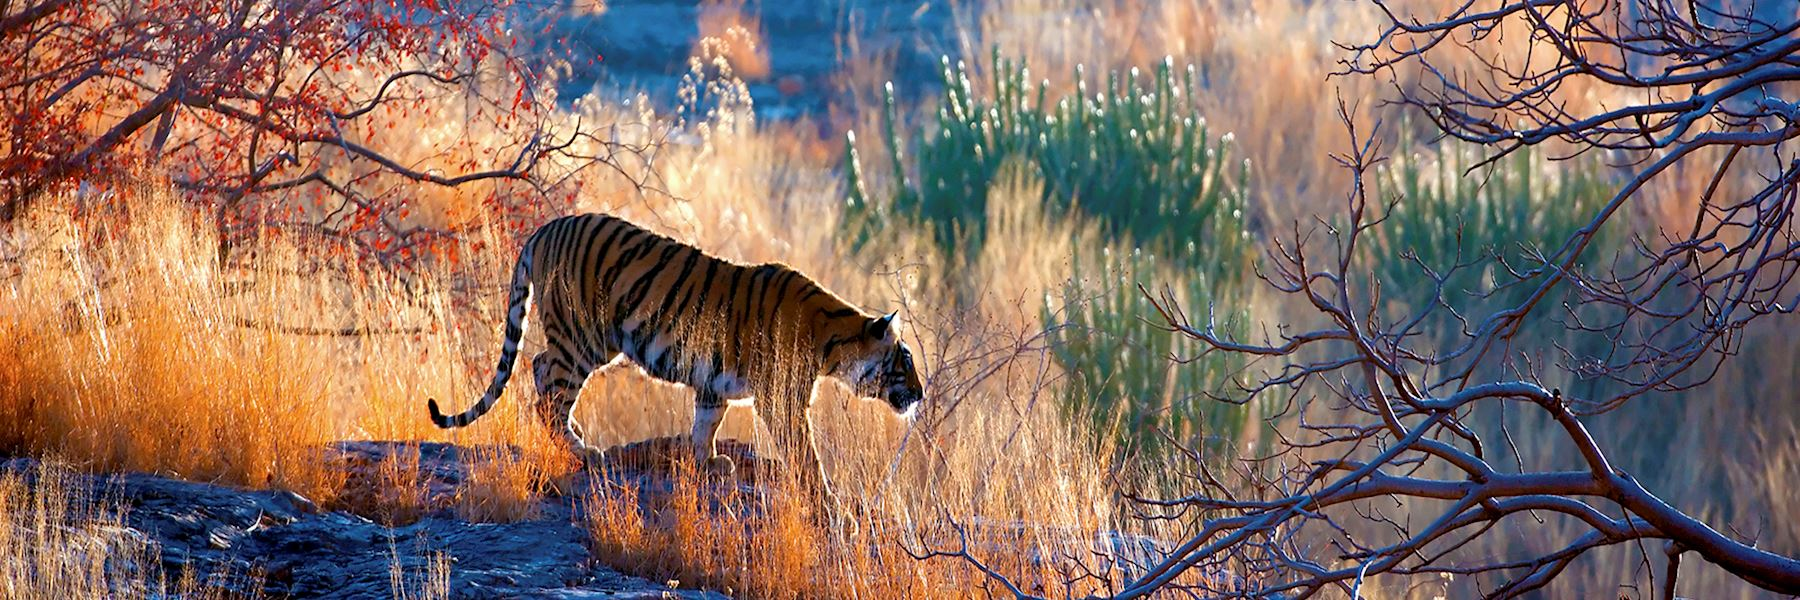 Corbett Tiger Reserve, India